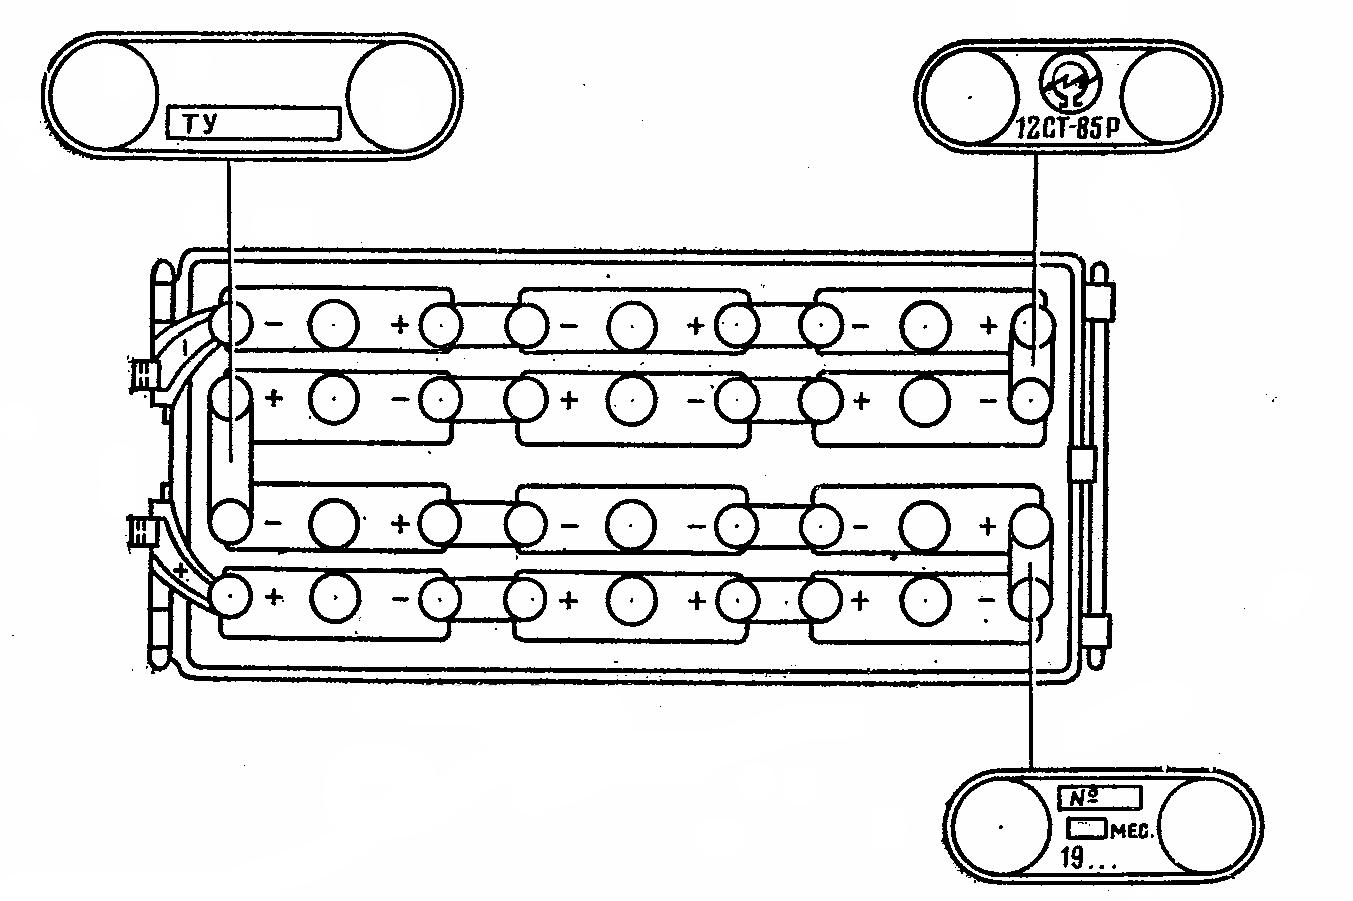 Маркировка 24-вольтовых танковых аккумуляторных батарей